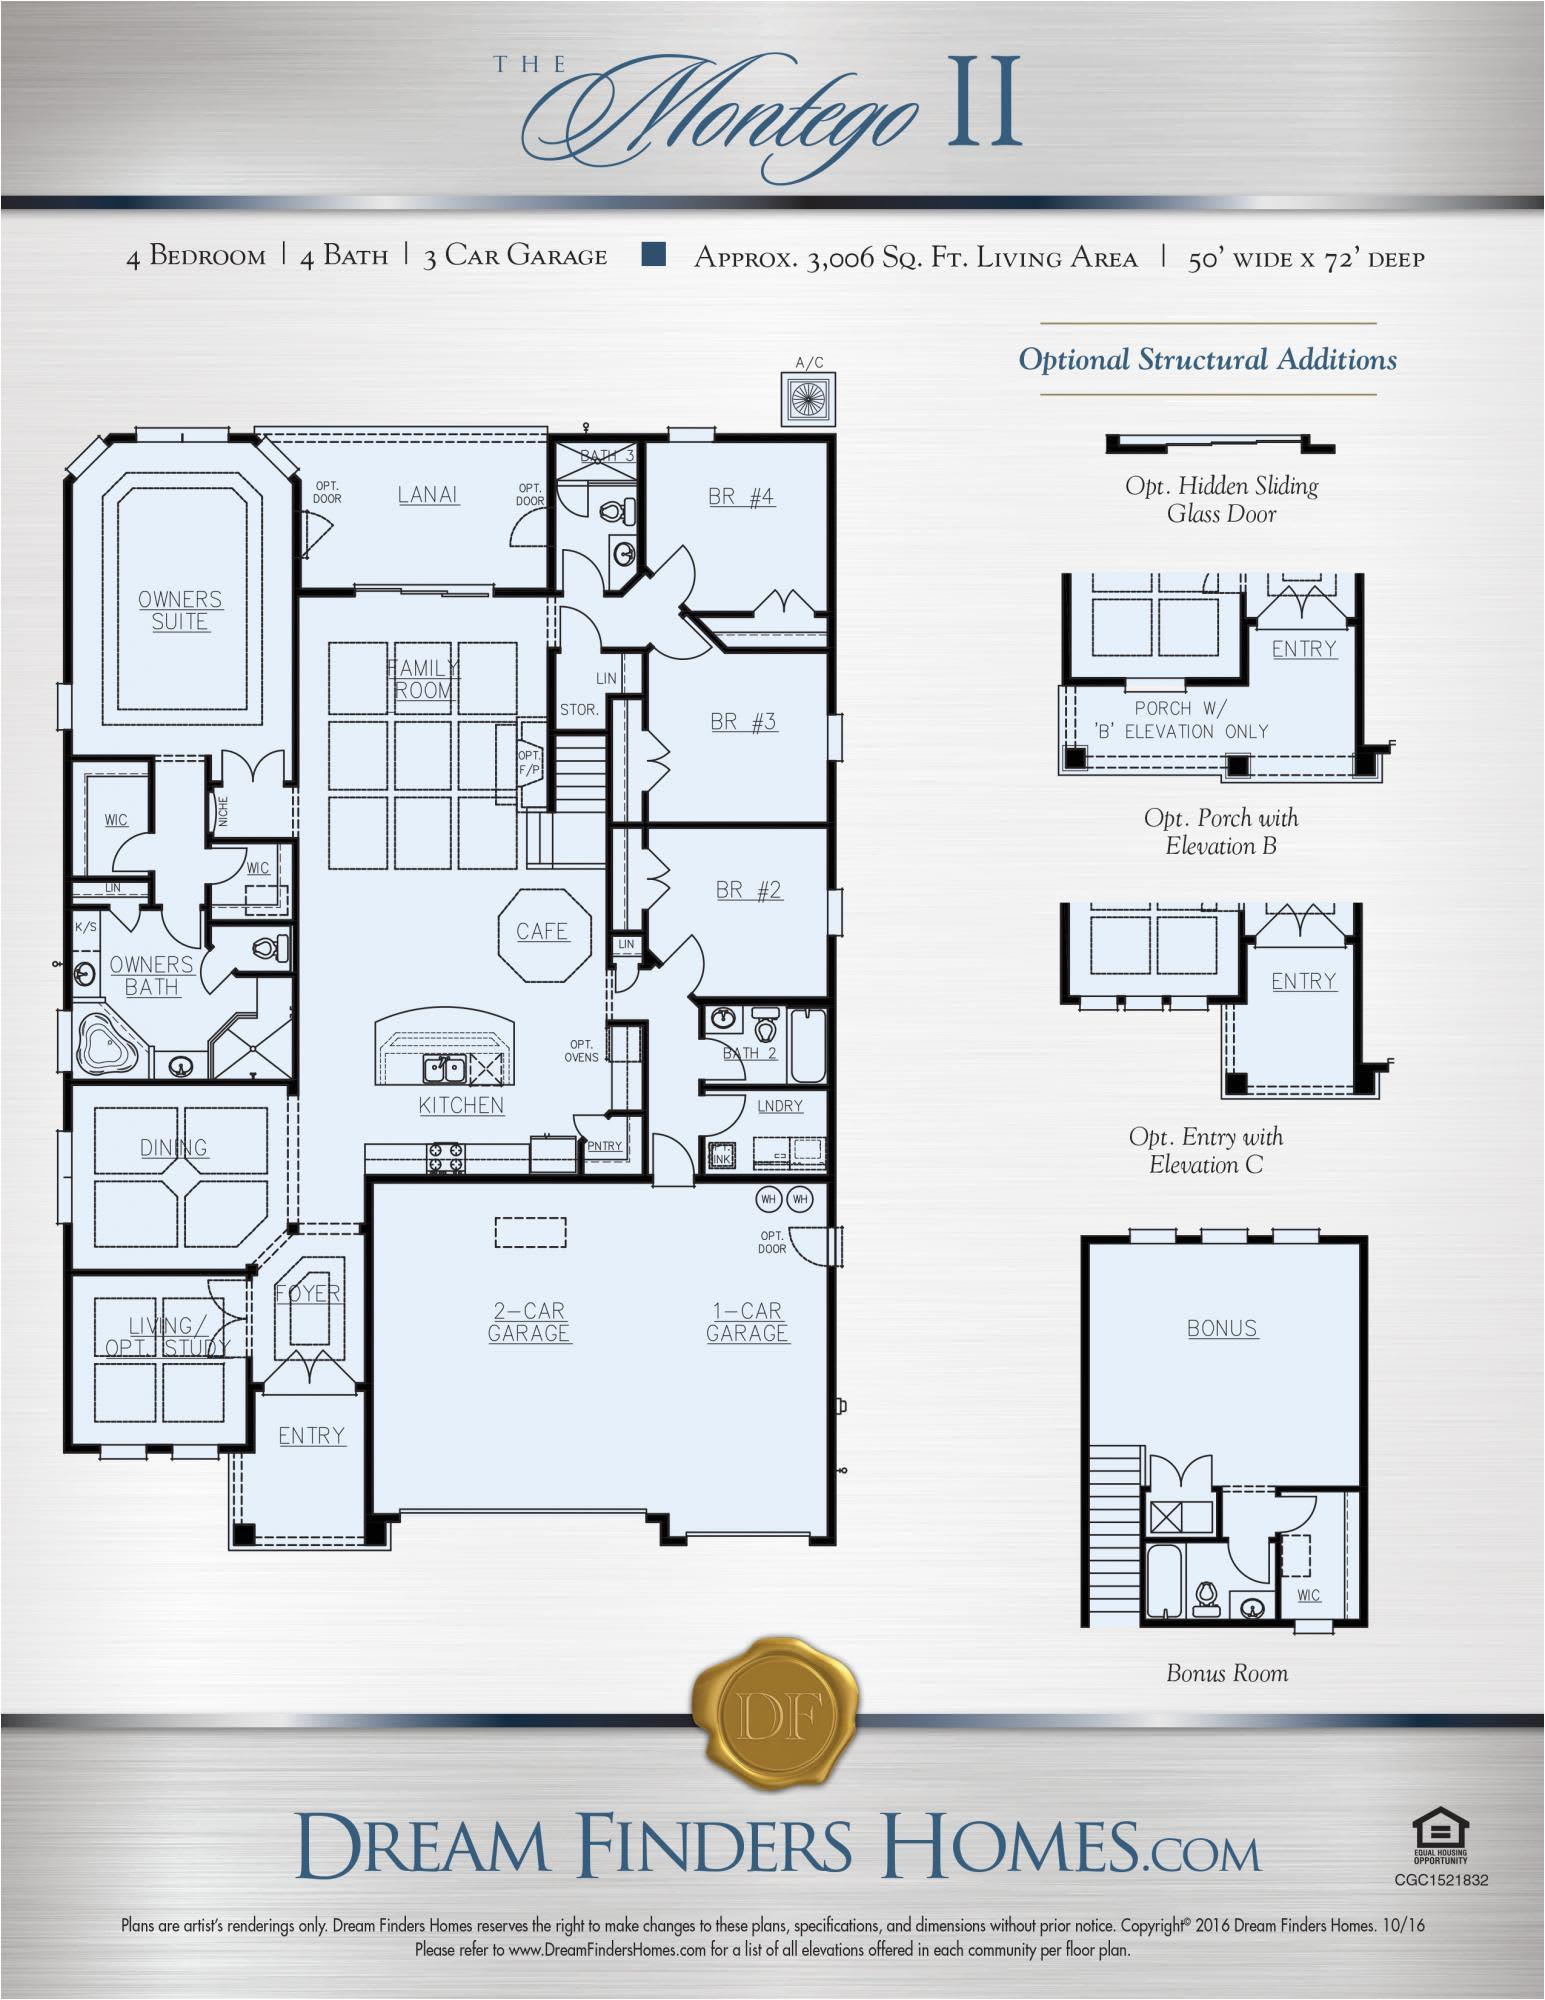 503852851688861 montego ii floor plan jax xzrtvj jpg